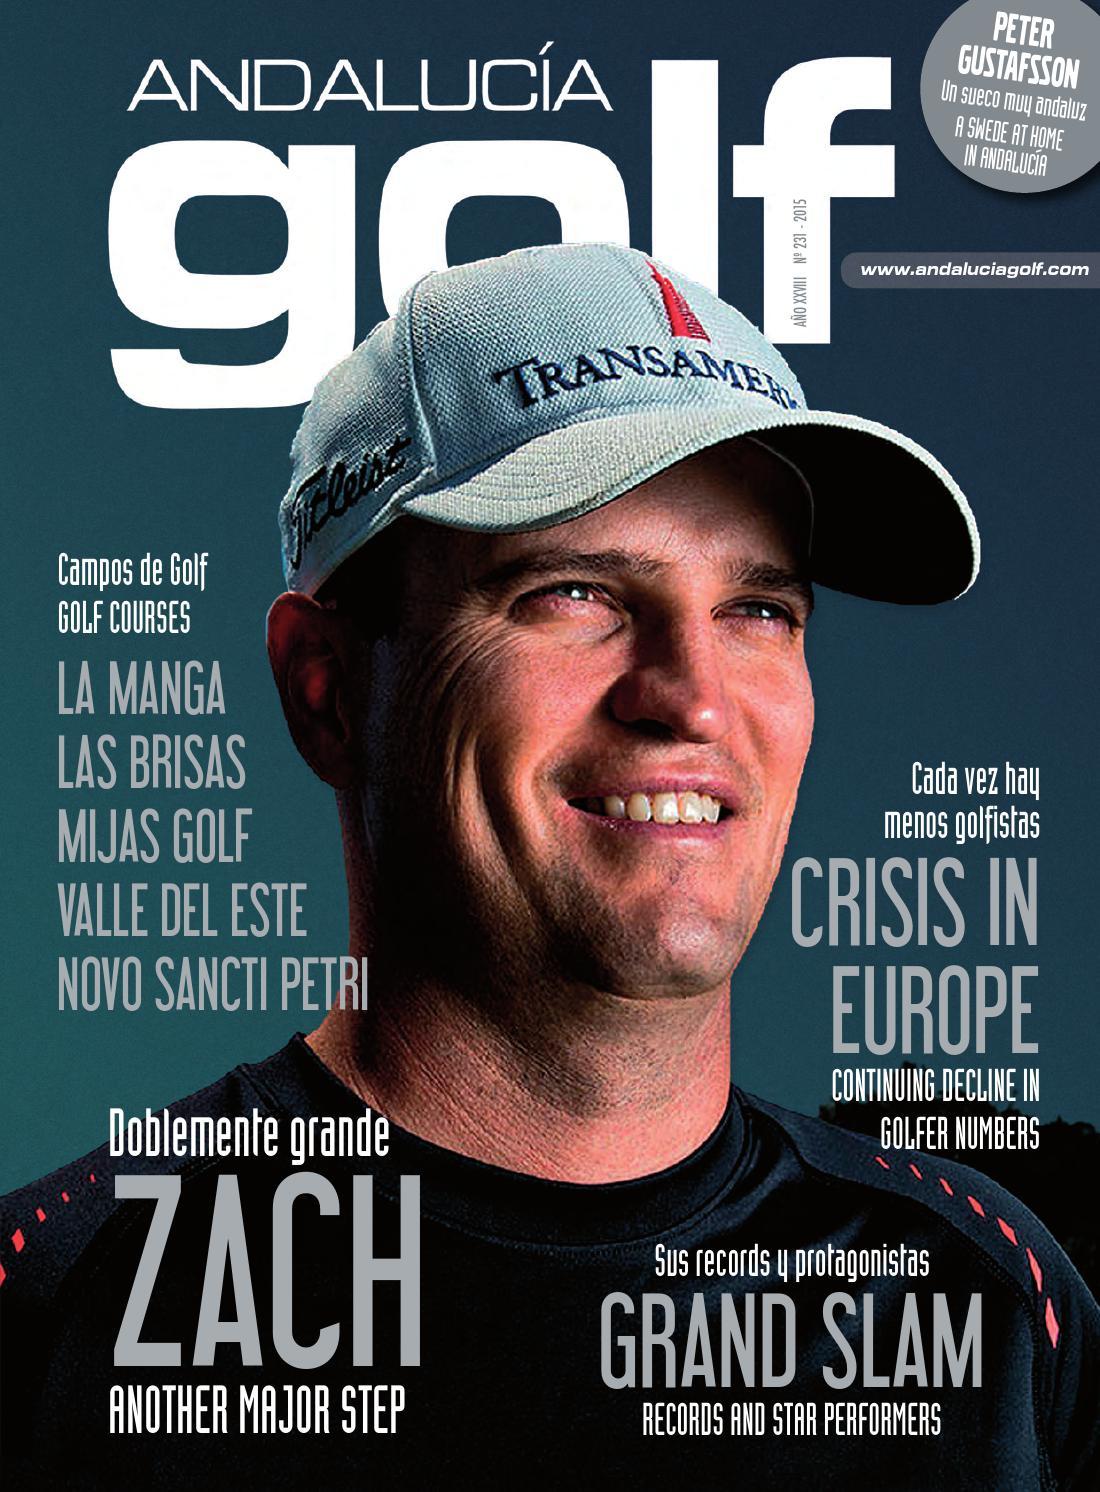 c5ca58d9c Revista Andalucía Golf Nº 231 - Agosto 2015 by Golf Red - issuu